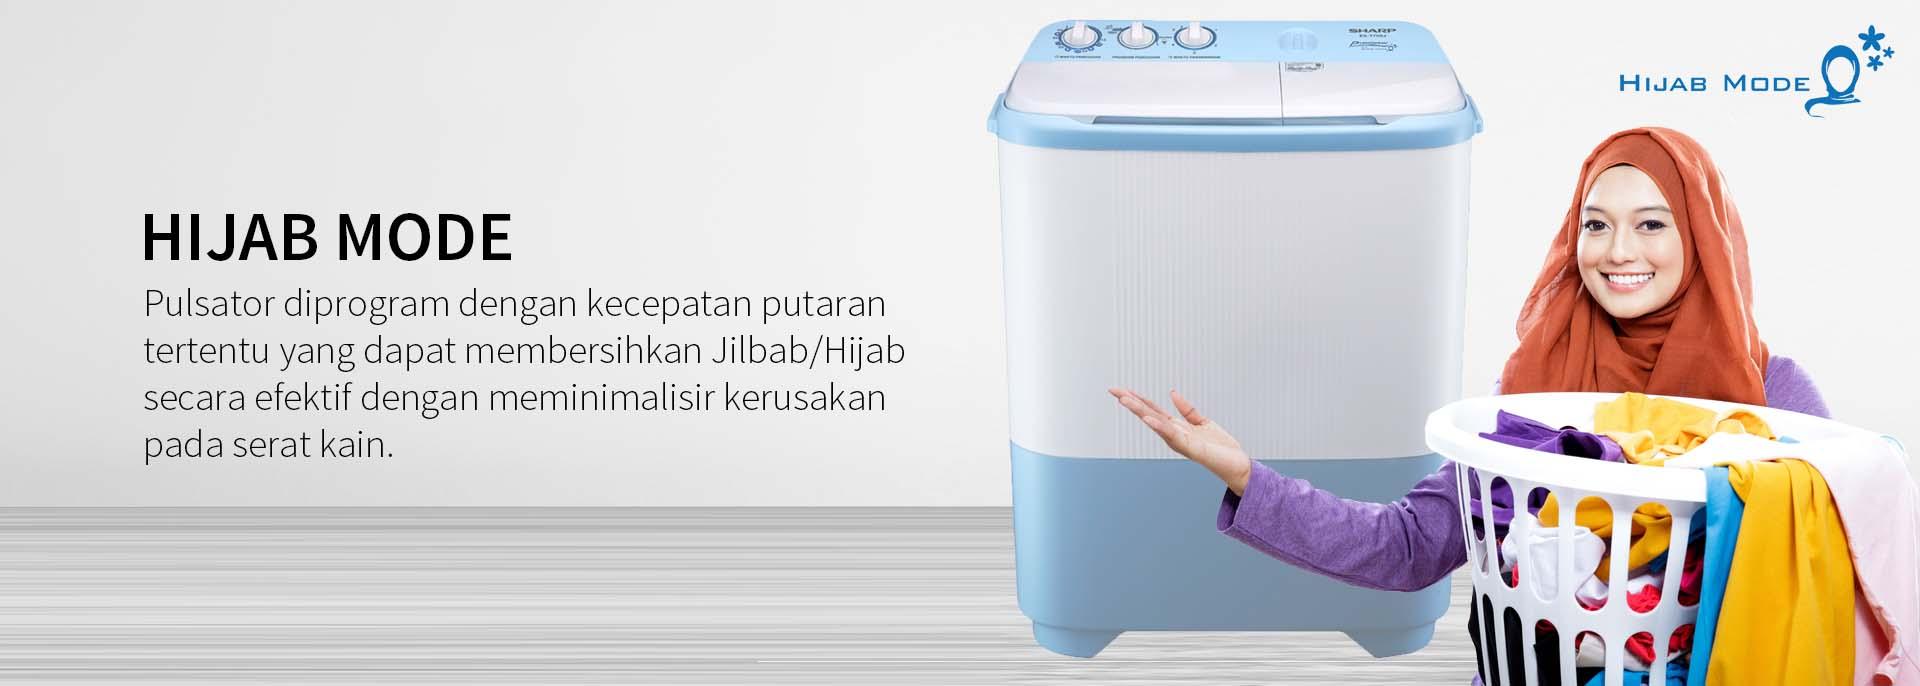 Hijab%20Mode%201-a.jpg